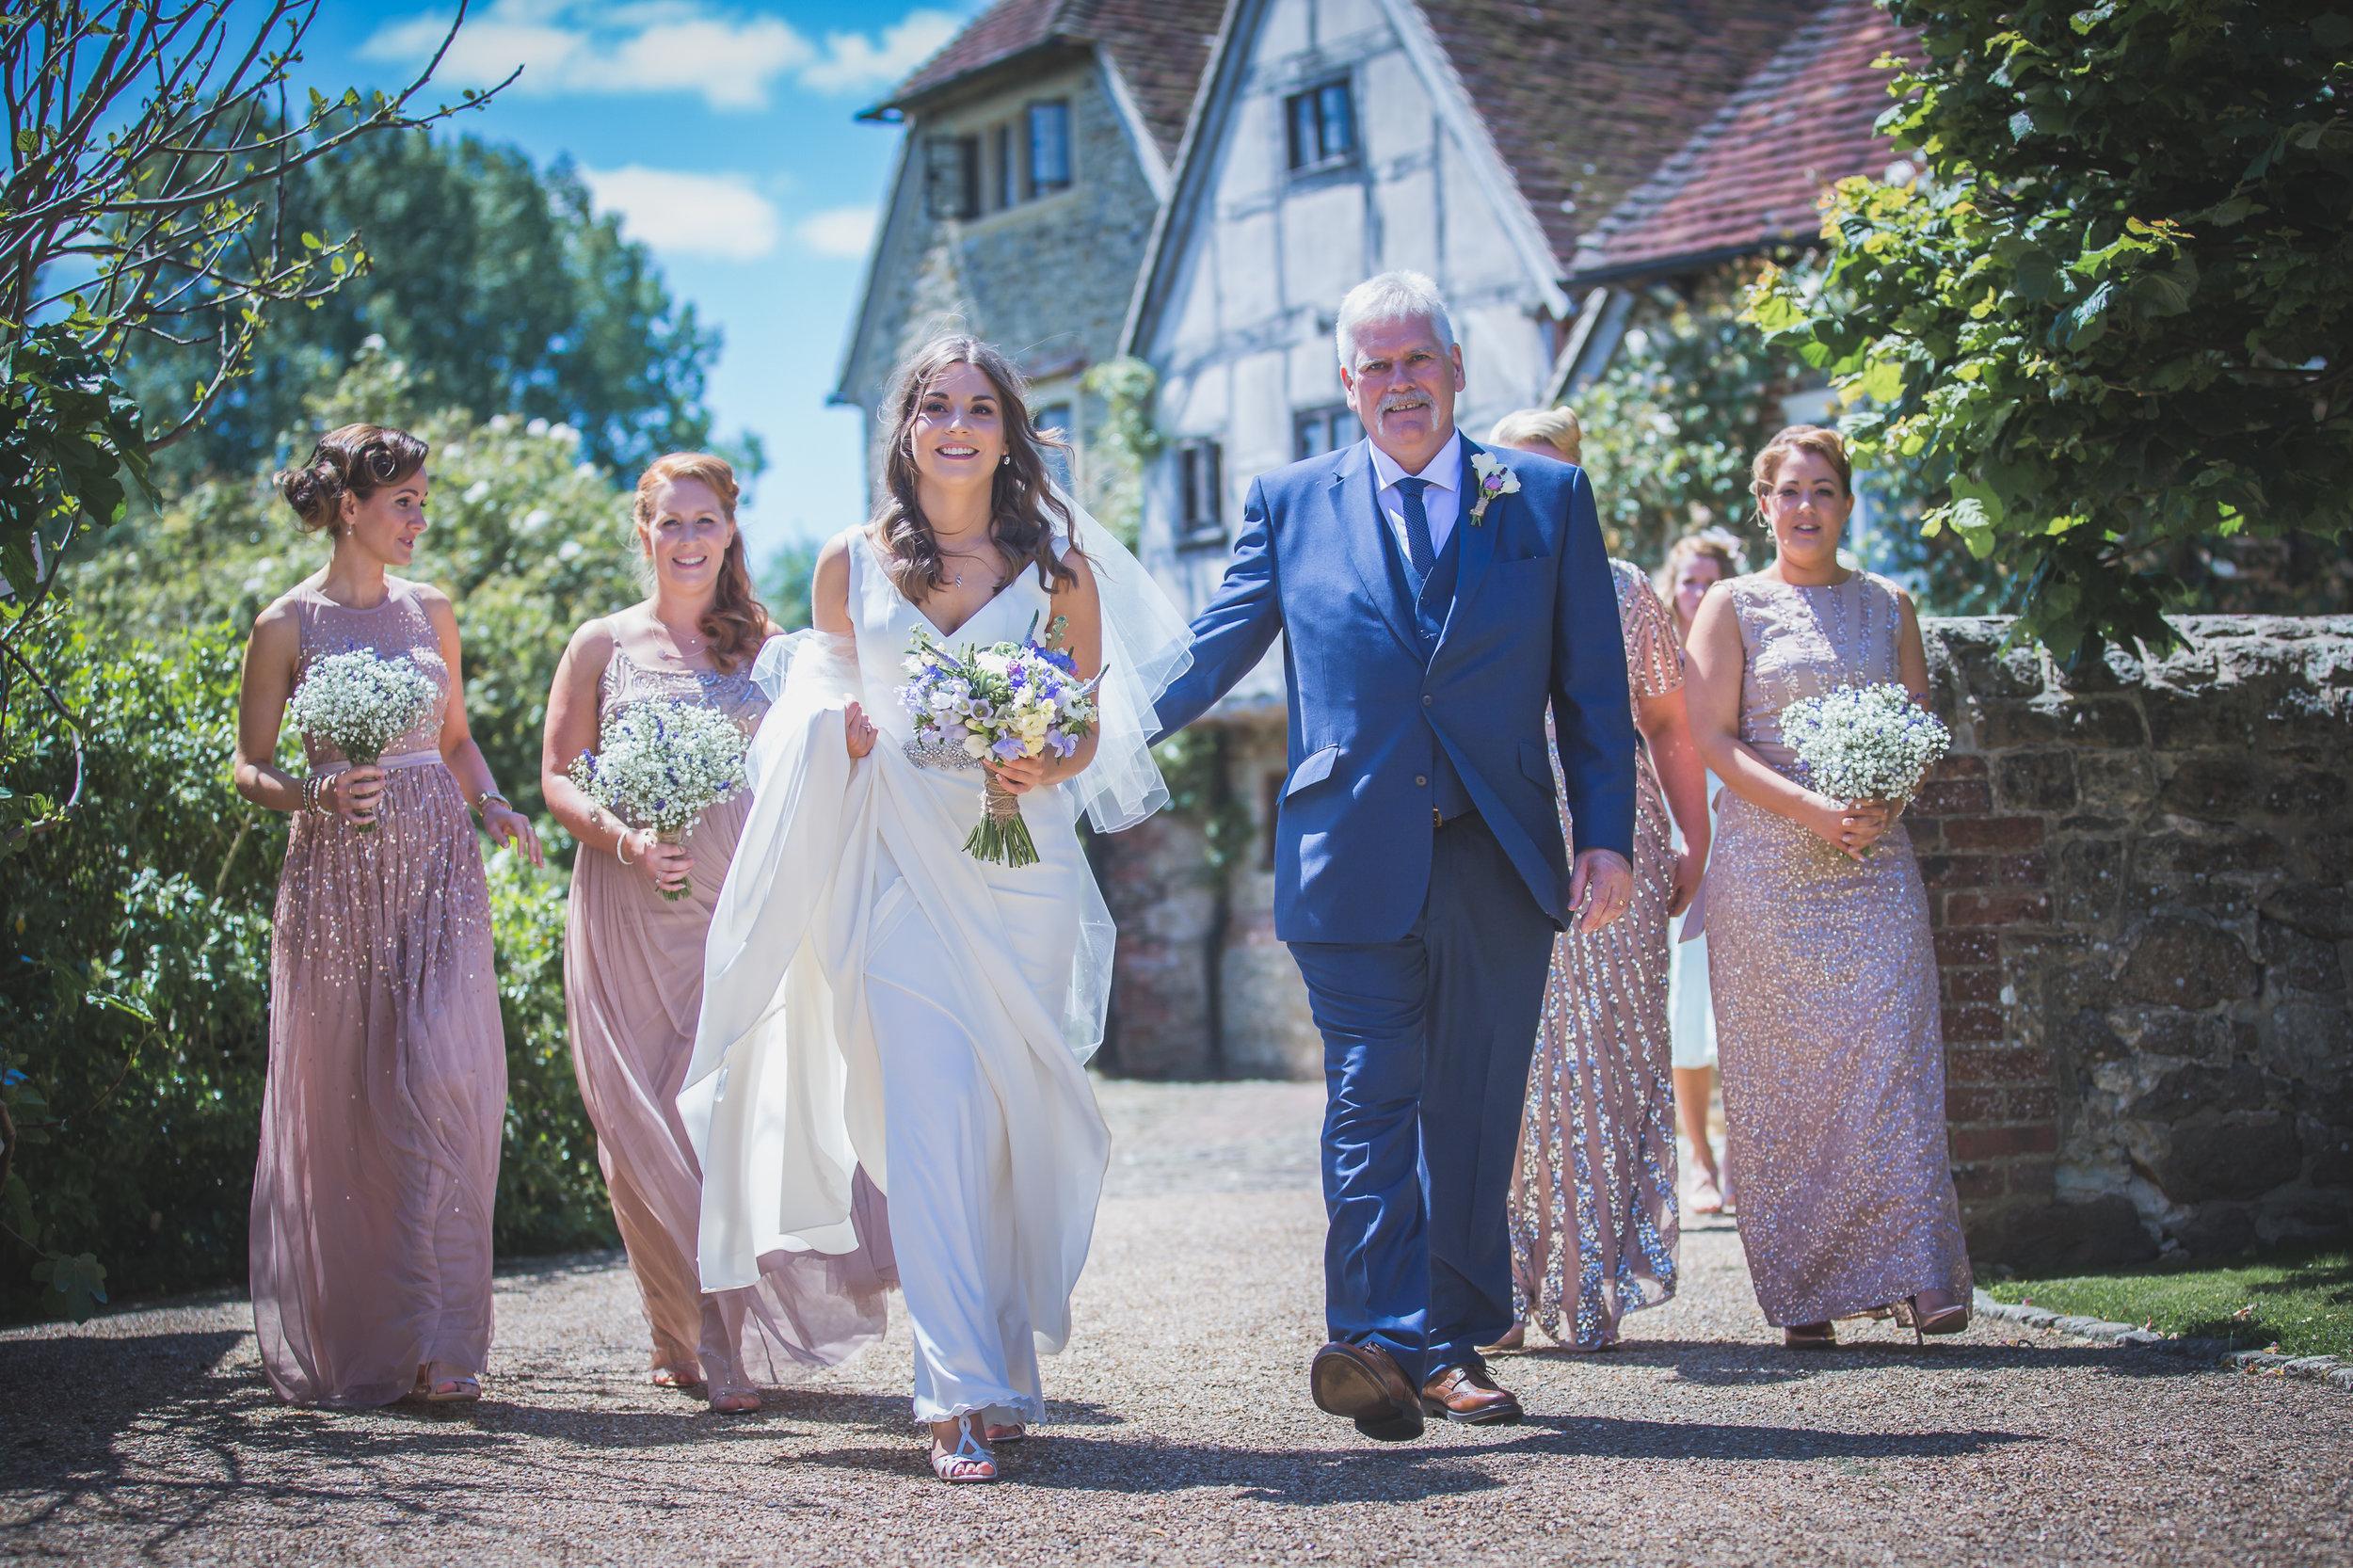 Grittenham Barn female wedding photographers west sussex petworth social-46.jpg